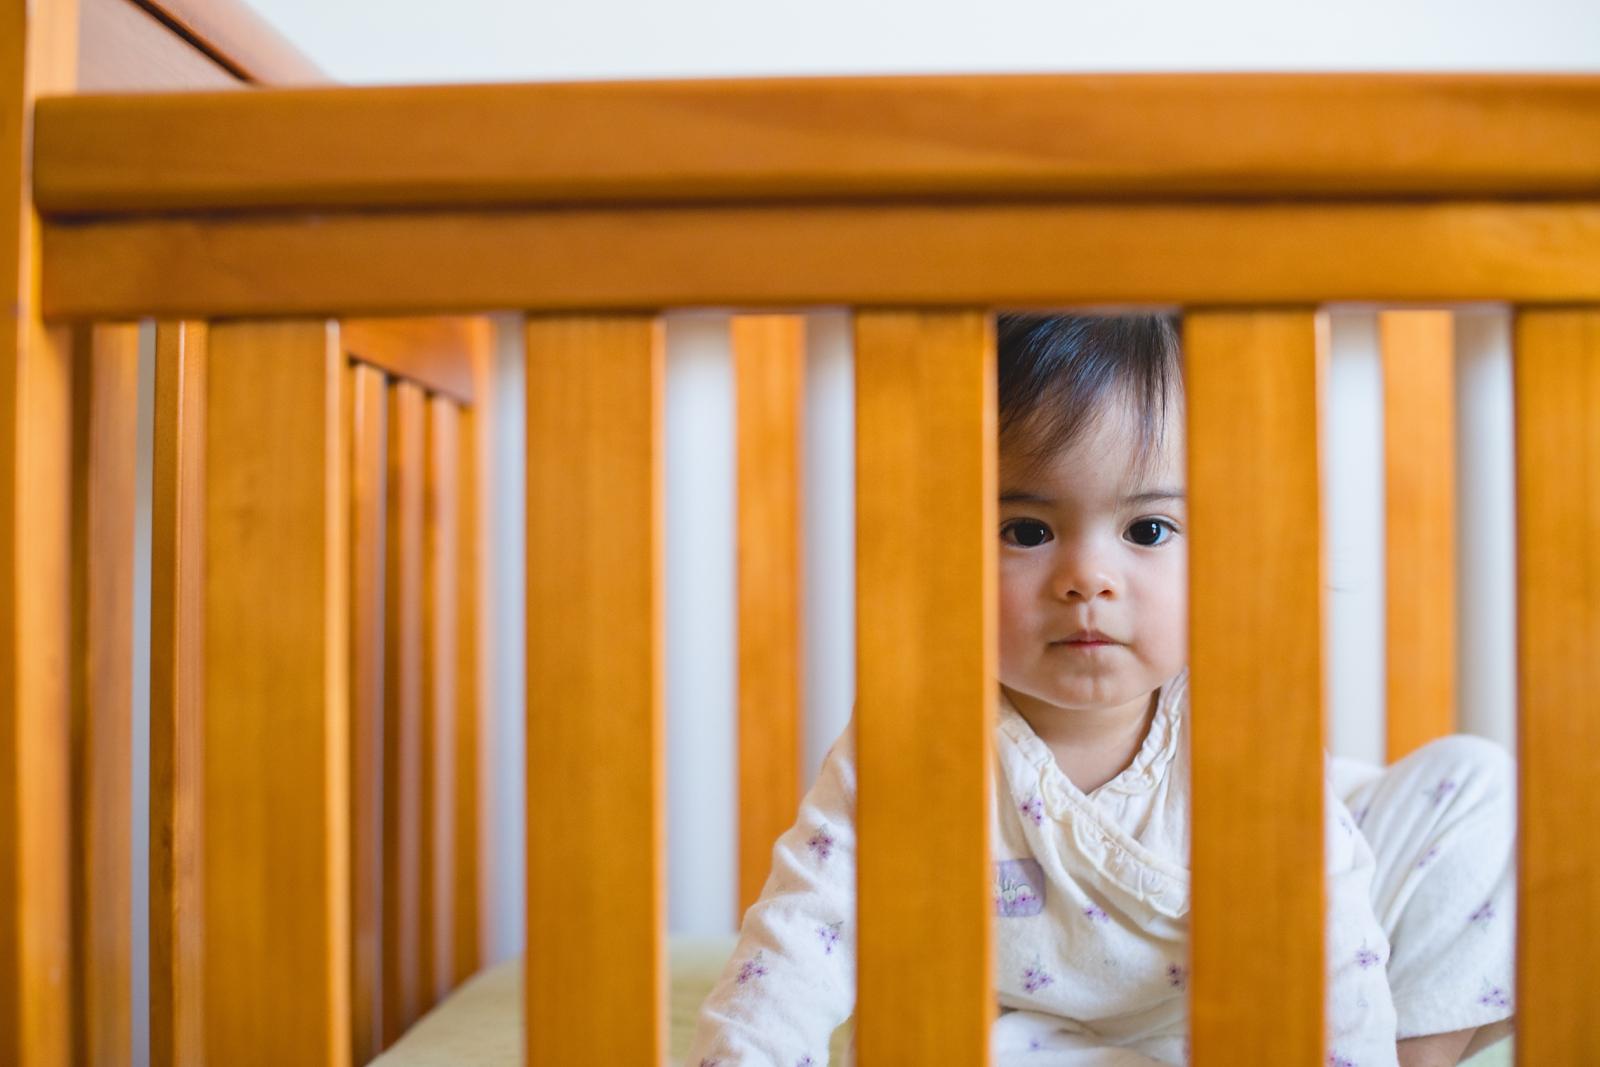 20130814-Amelia Stands in Crib-BLOGGrid_0010.jpg